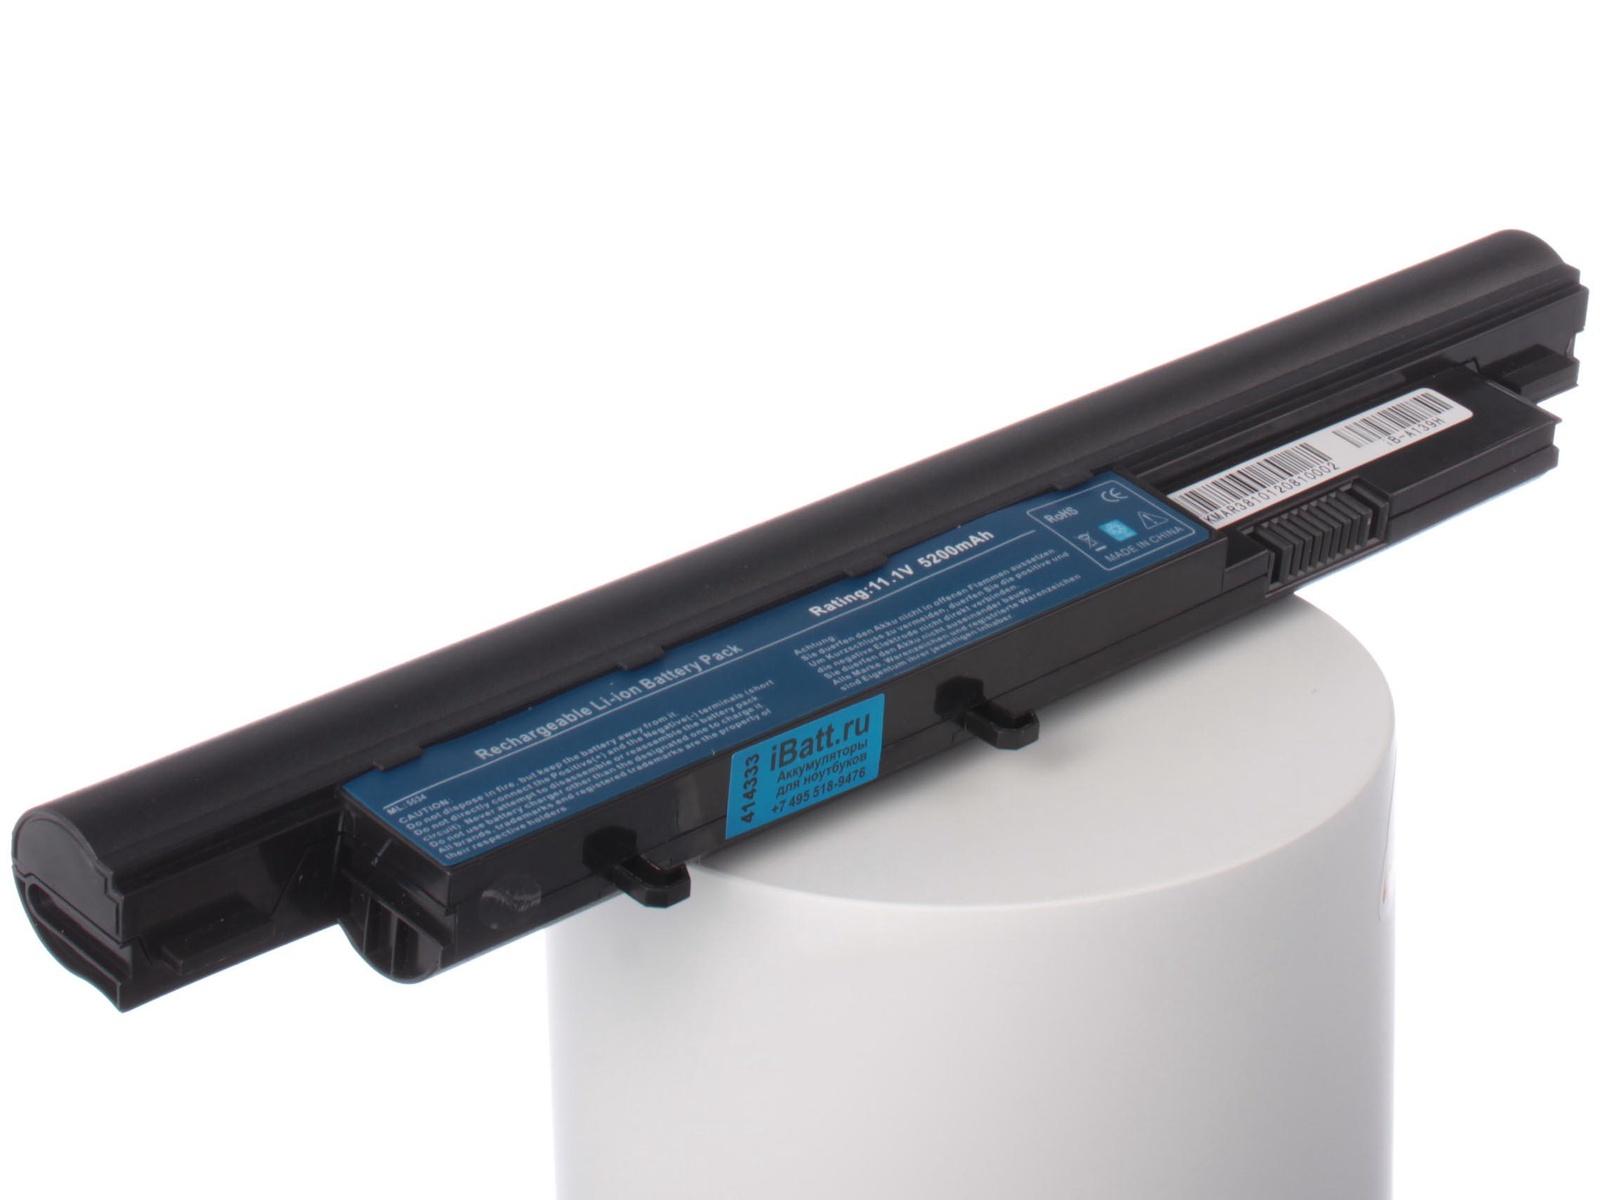 Аккумулятор для ноутбука iBatt Acer, Gateway, Packard Bell, Acer AS09D70, AS09D31, AS09D56, AS09D36, AS09D41, AS09D51, AS09D75 pitatel ad 087 блок питания для ноутбуков acer benq dell emachines fujitsu siemens gateway packard bell 19v 4 74a